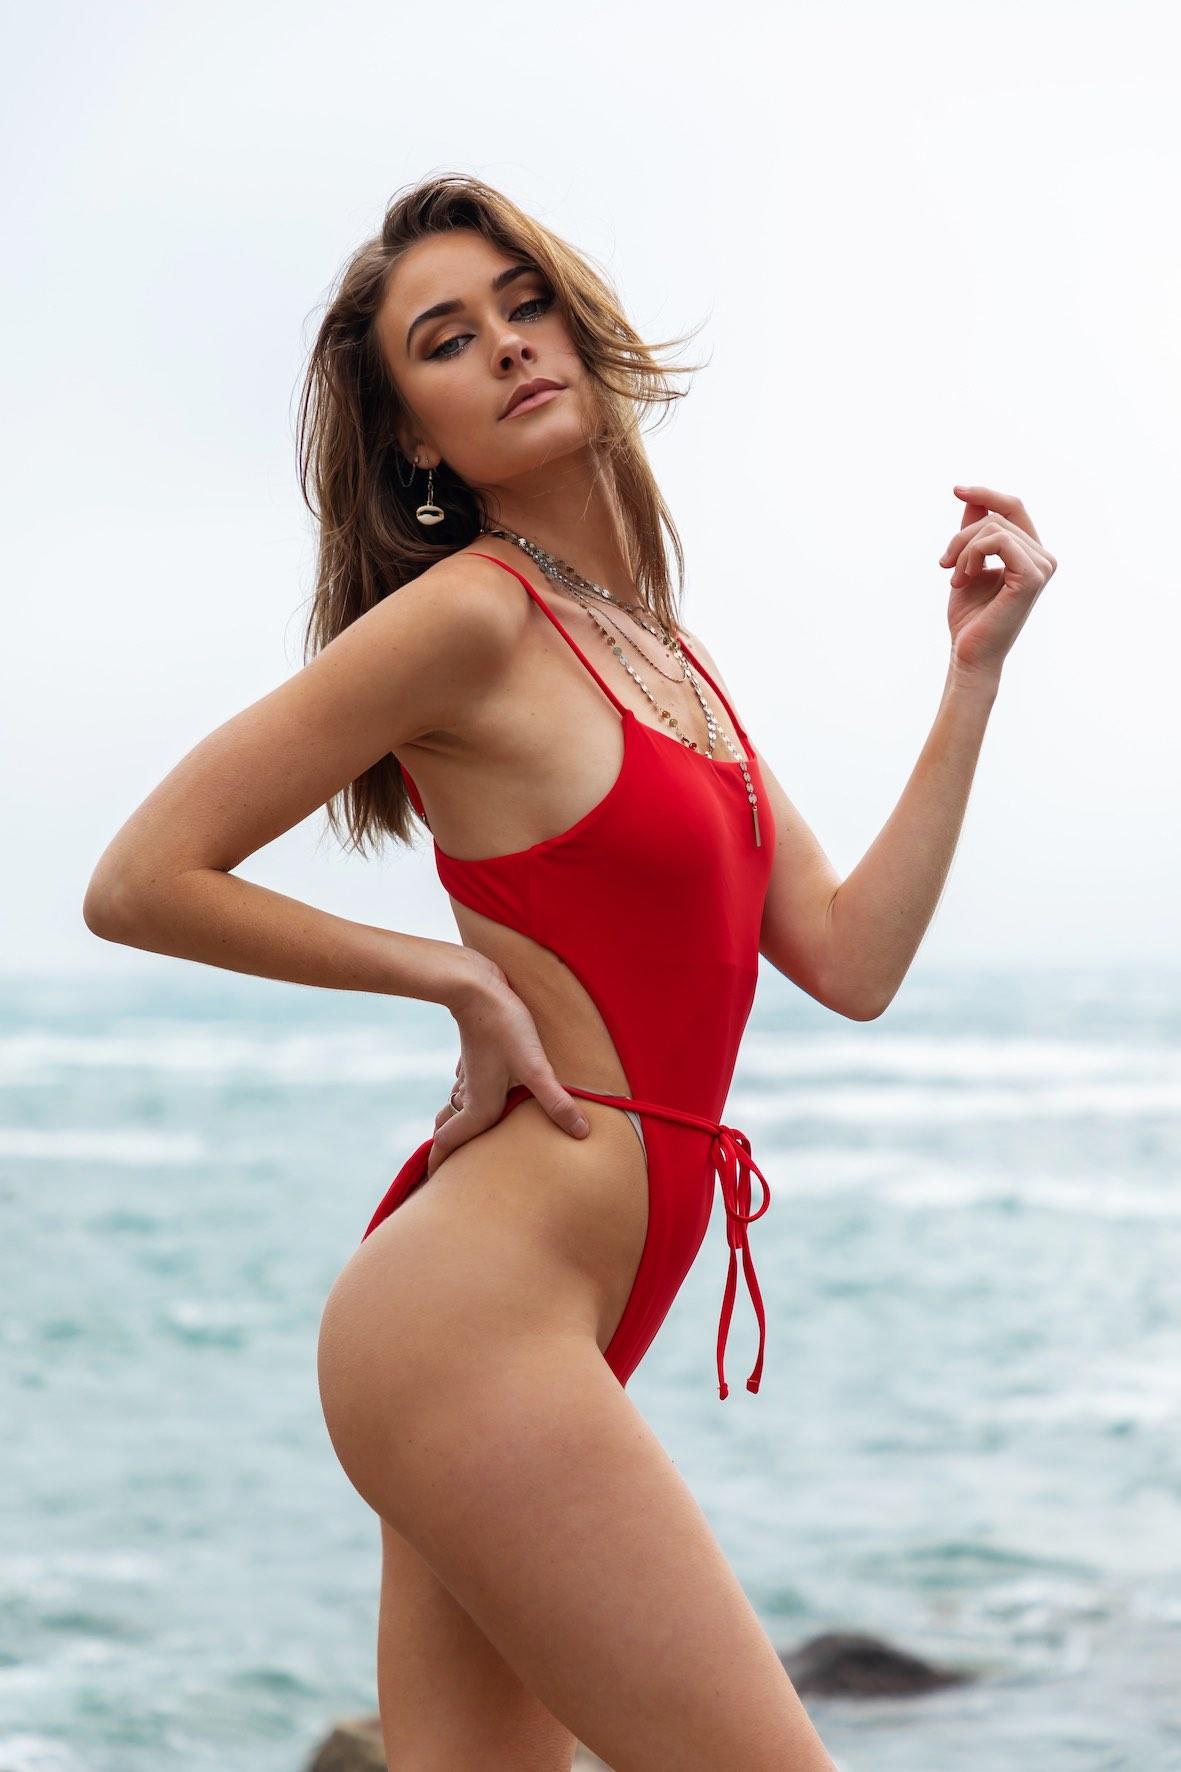 Meet Tanielle McCallum as our LW Babe of the Week